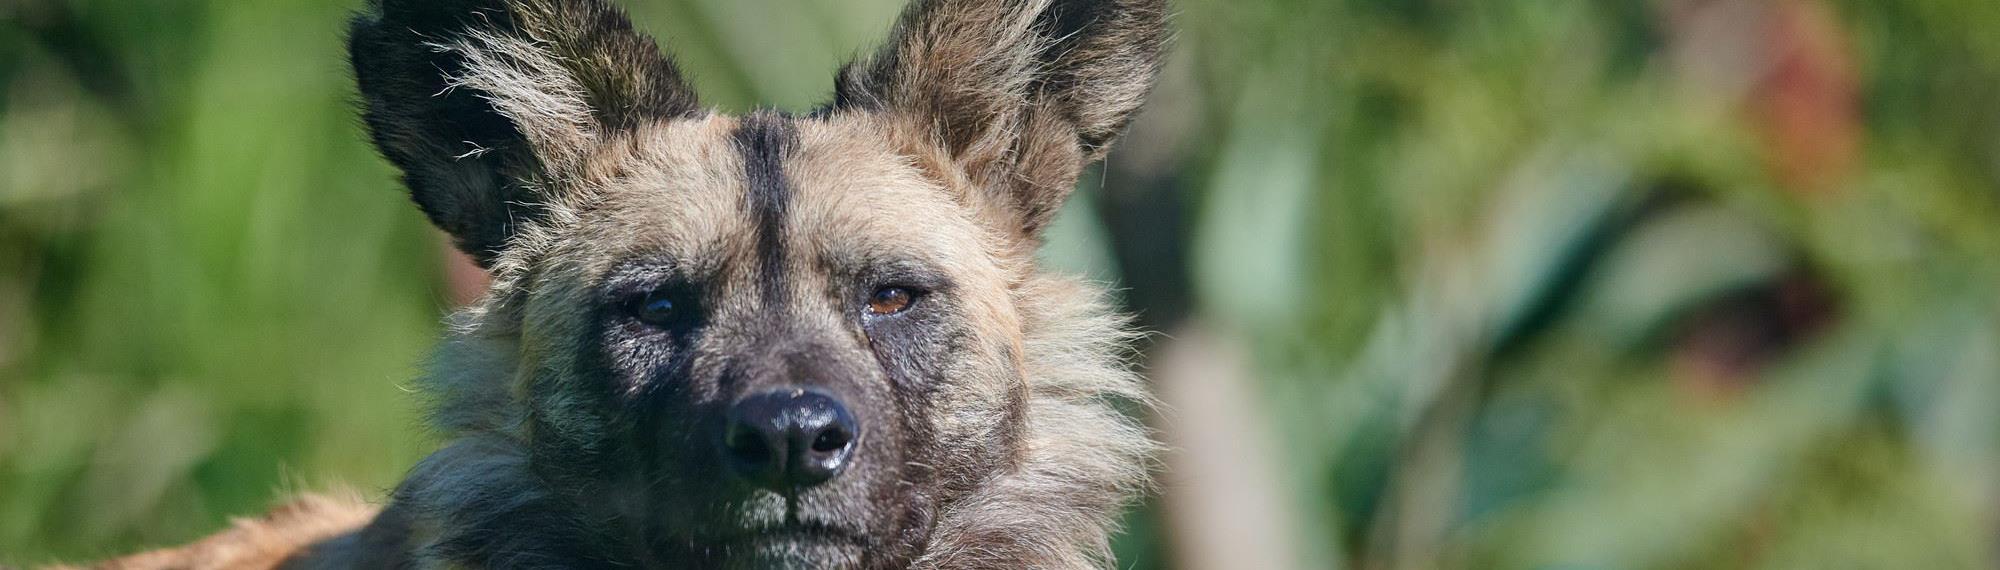 African Wild Dog staring at camera